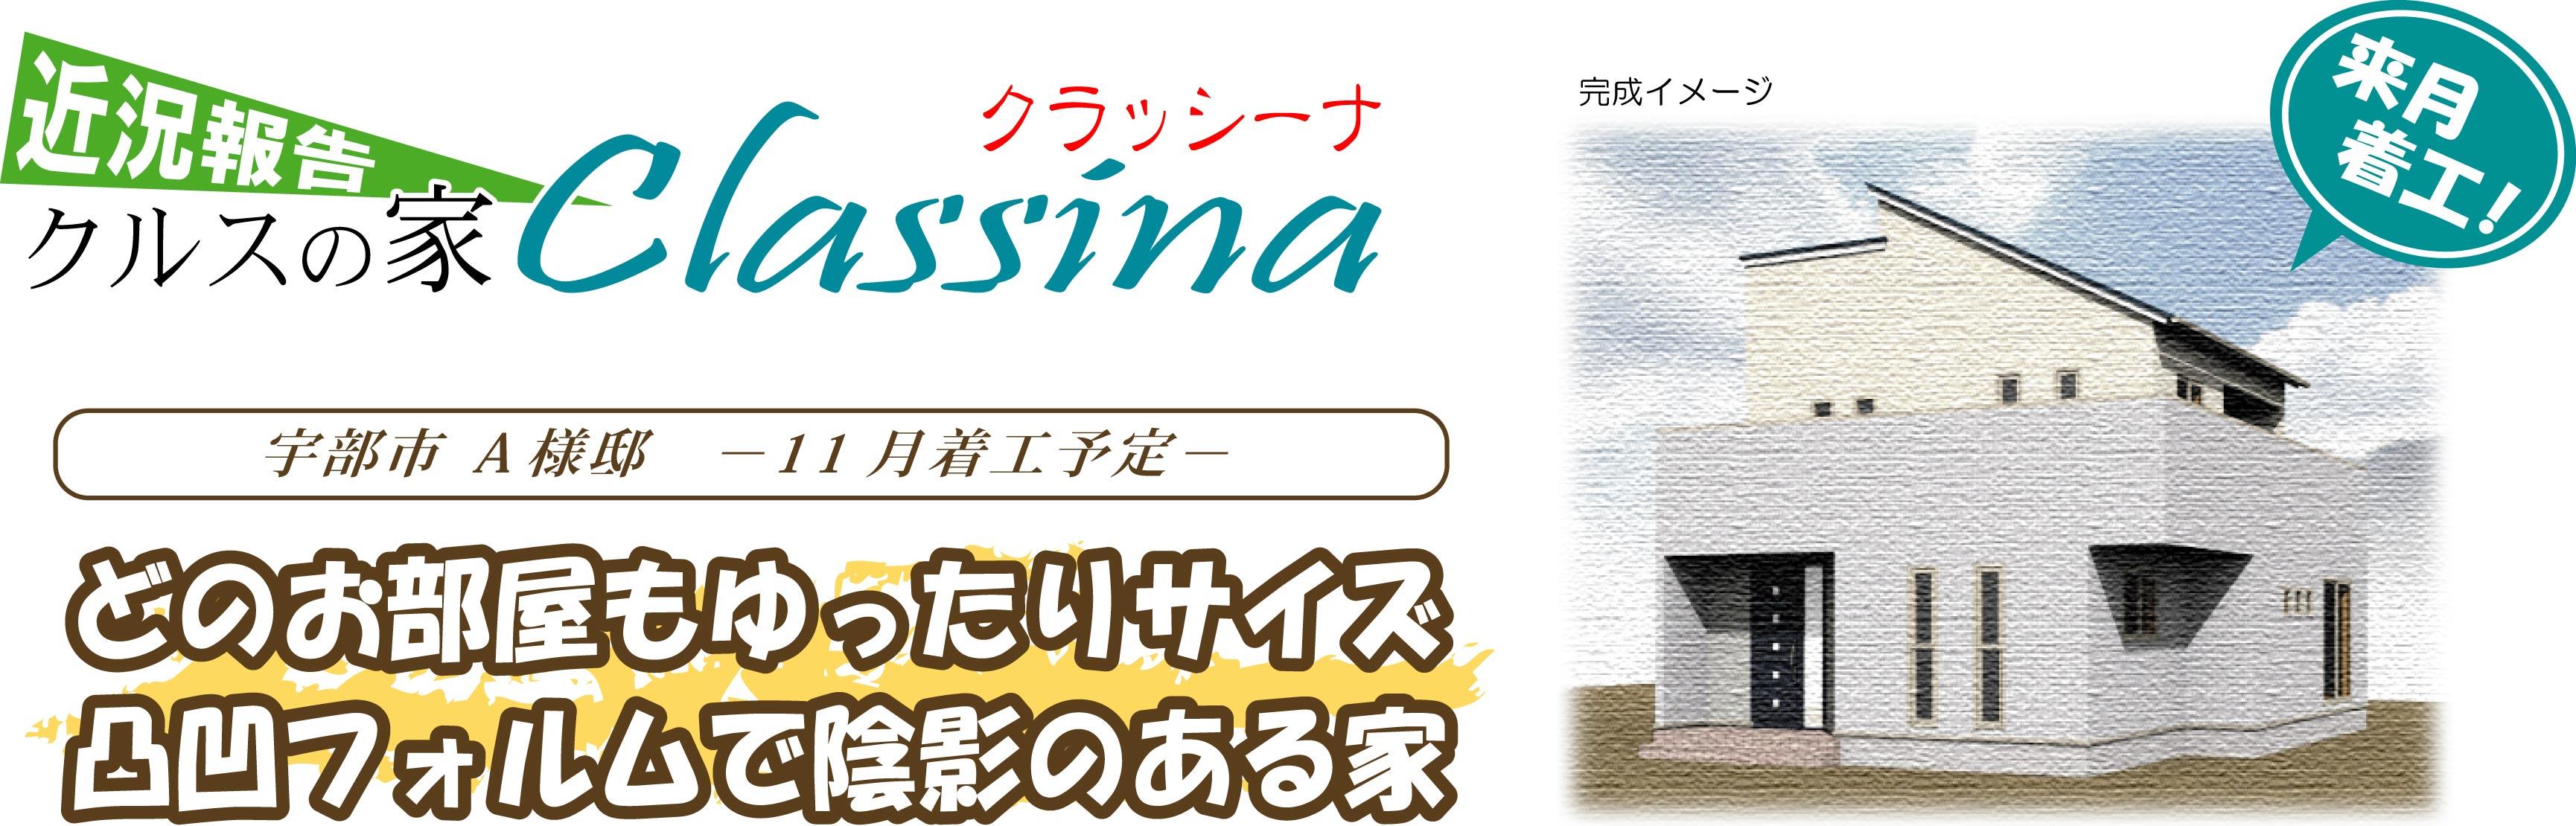 KuraSi-natu-sin77-02.jpg